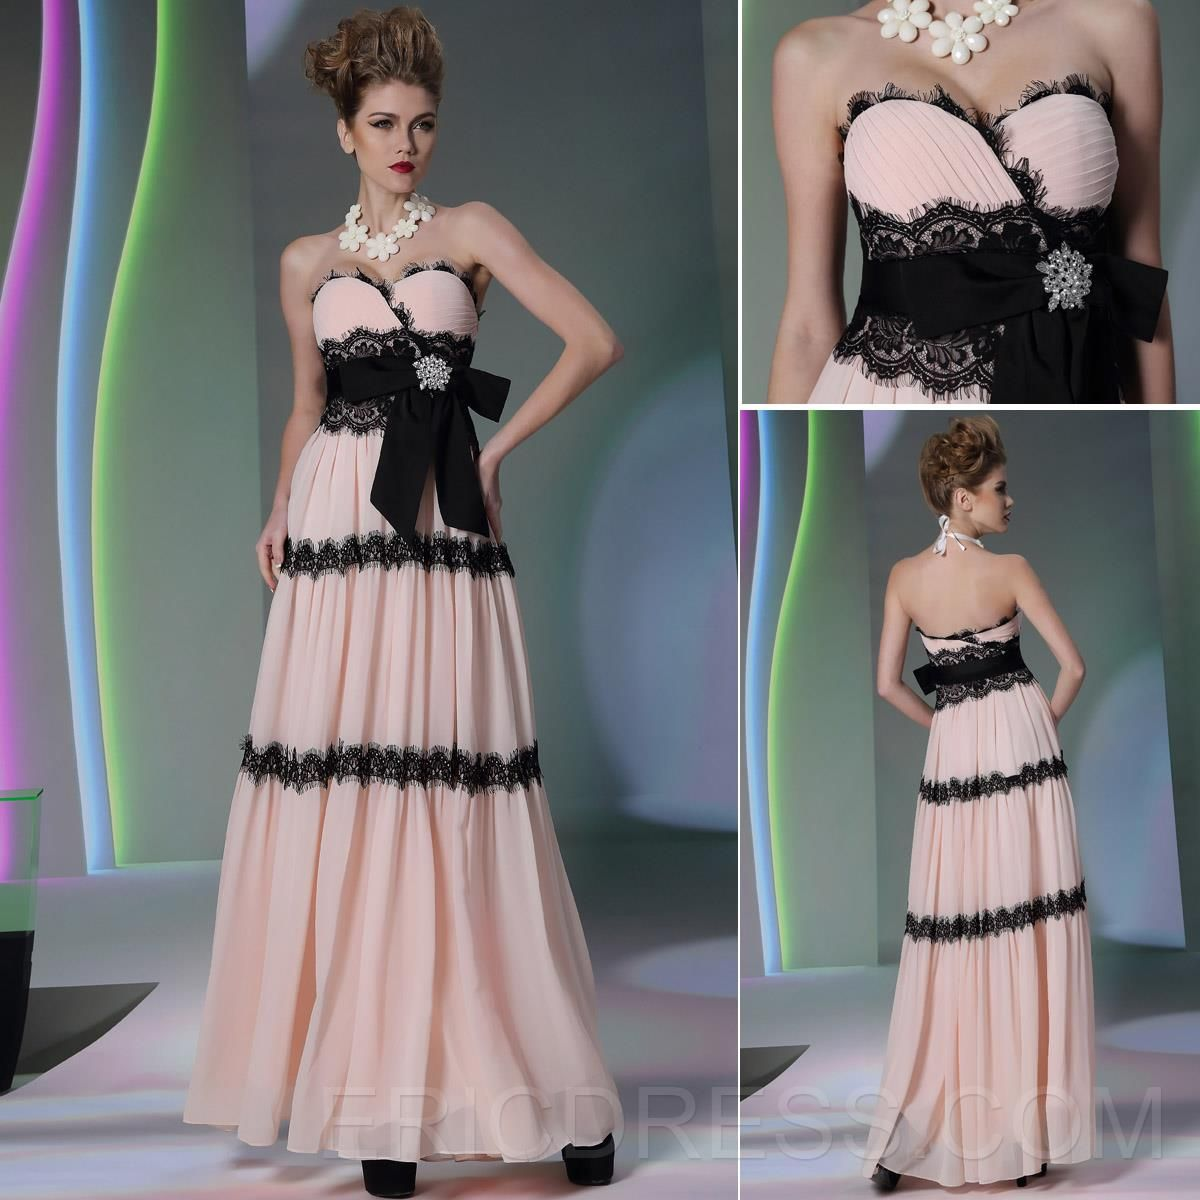 Faddish Sweetheart Sashes A-Line Evening Dress 7